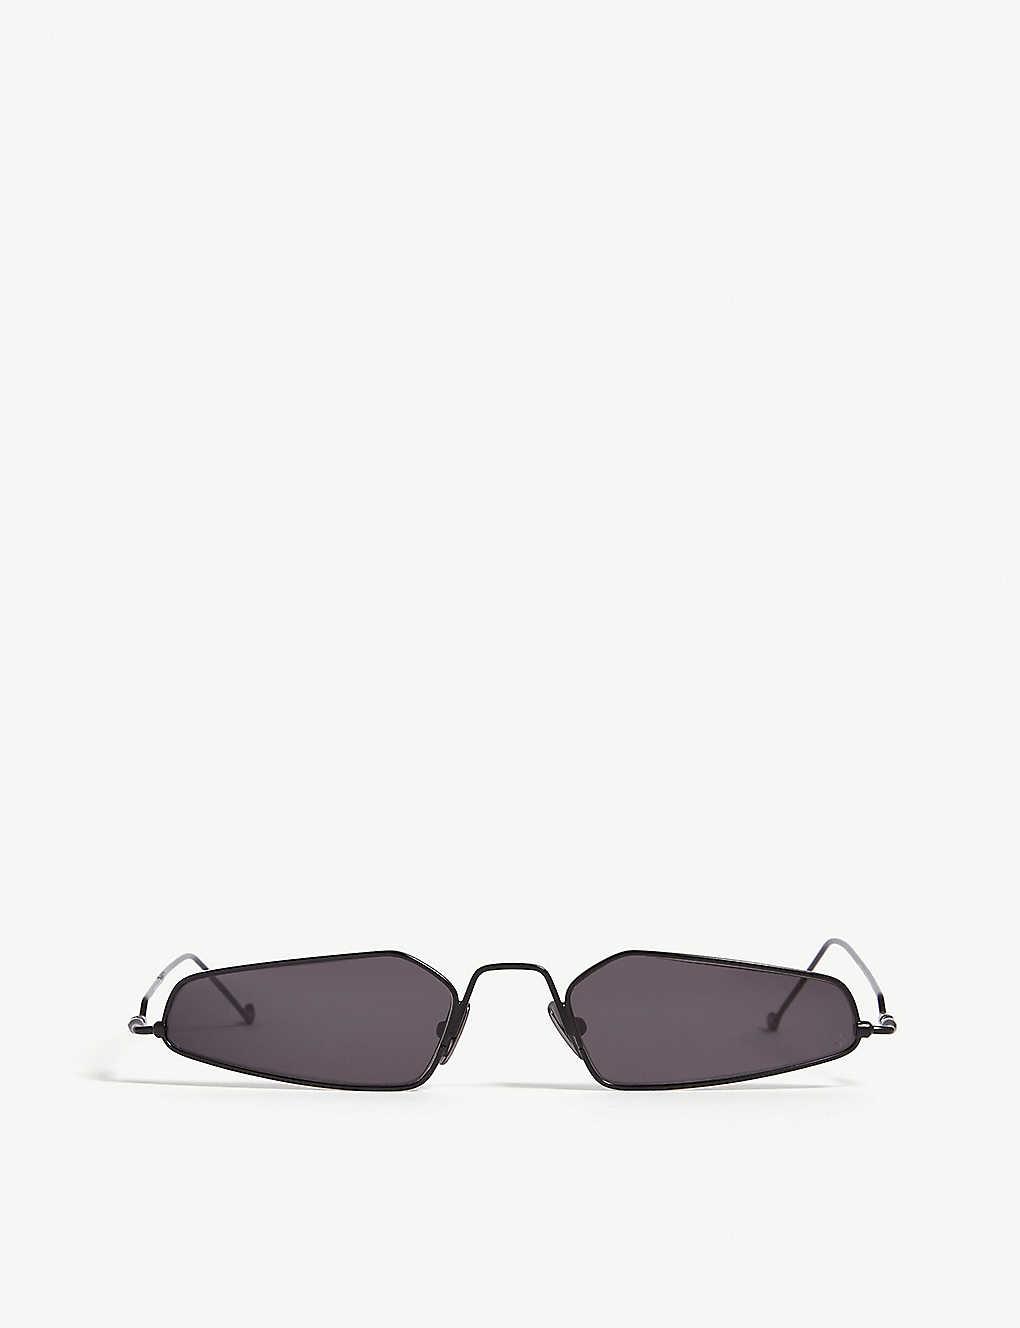 1b44fcb0b1602 NATURE OF REALITY (NOR) - Irregular-frame sunglasses